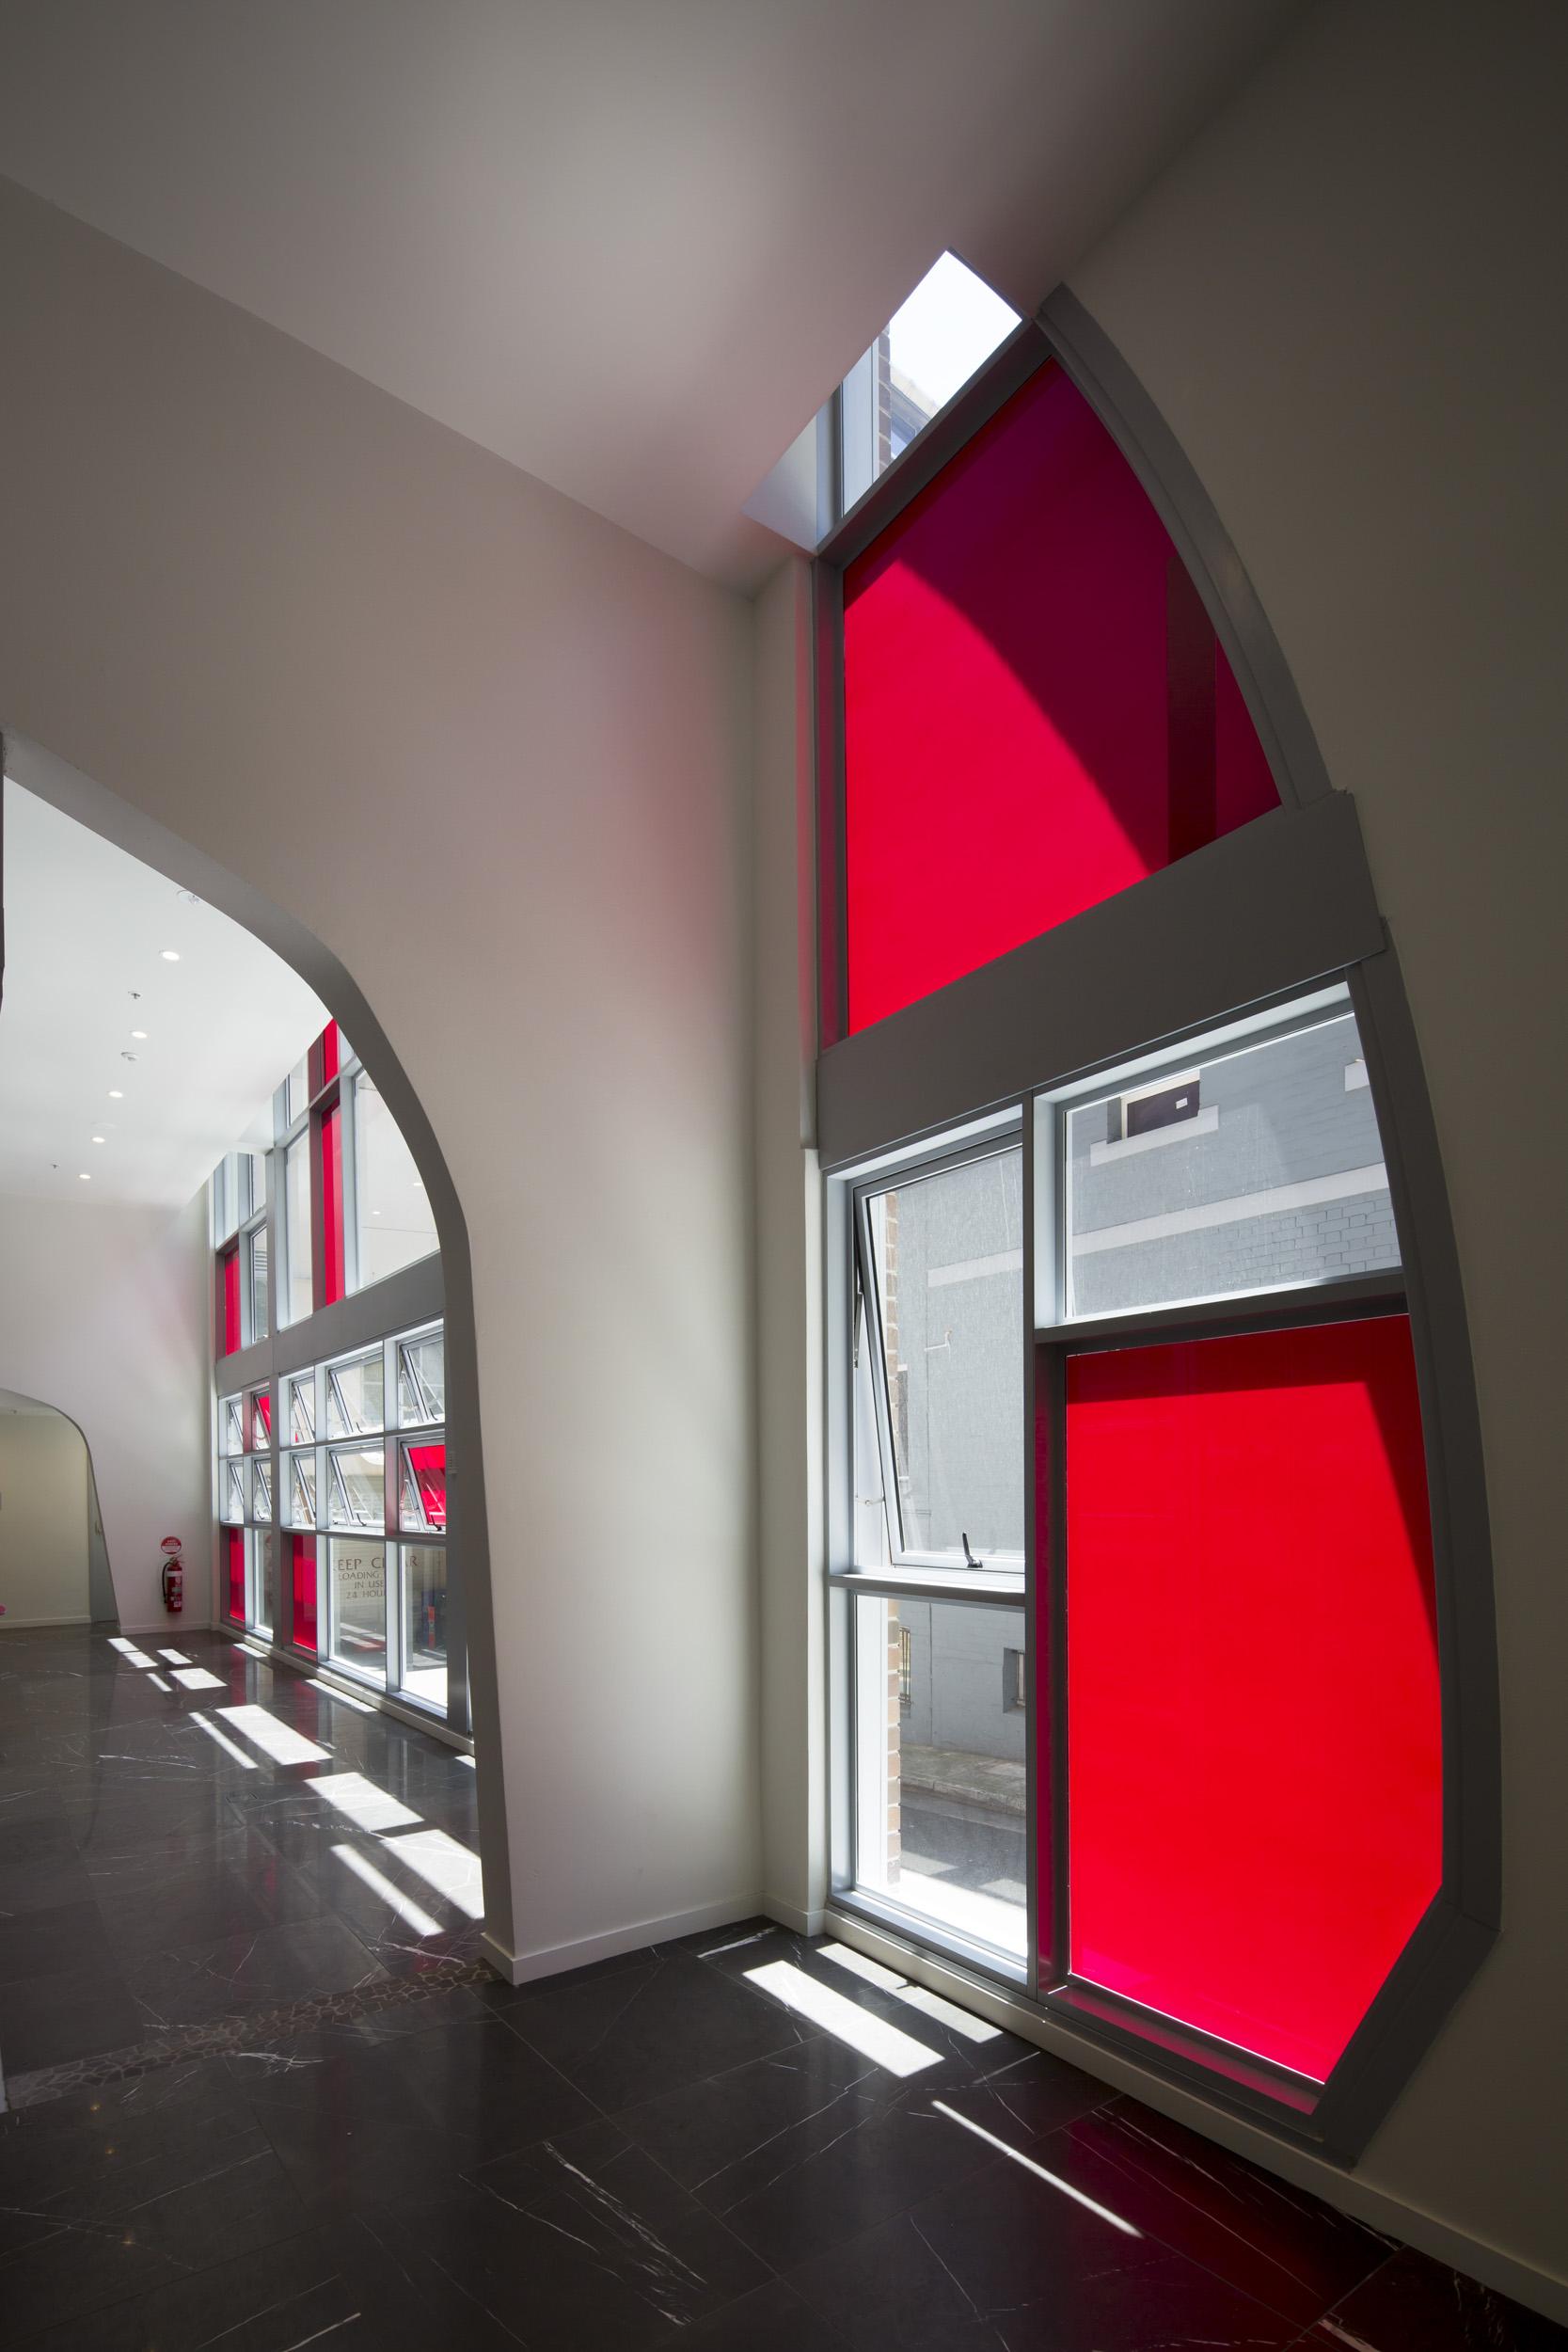 architecture_photography_sydney_australia_18.jpg